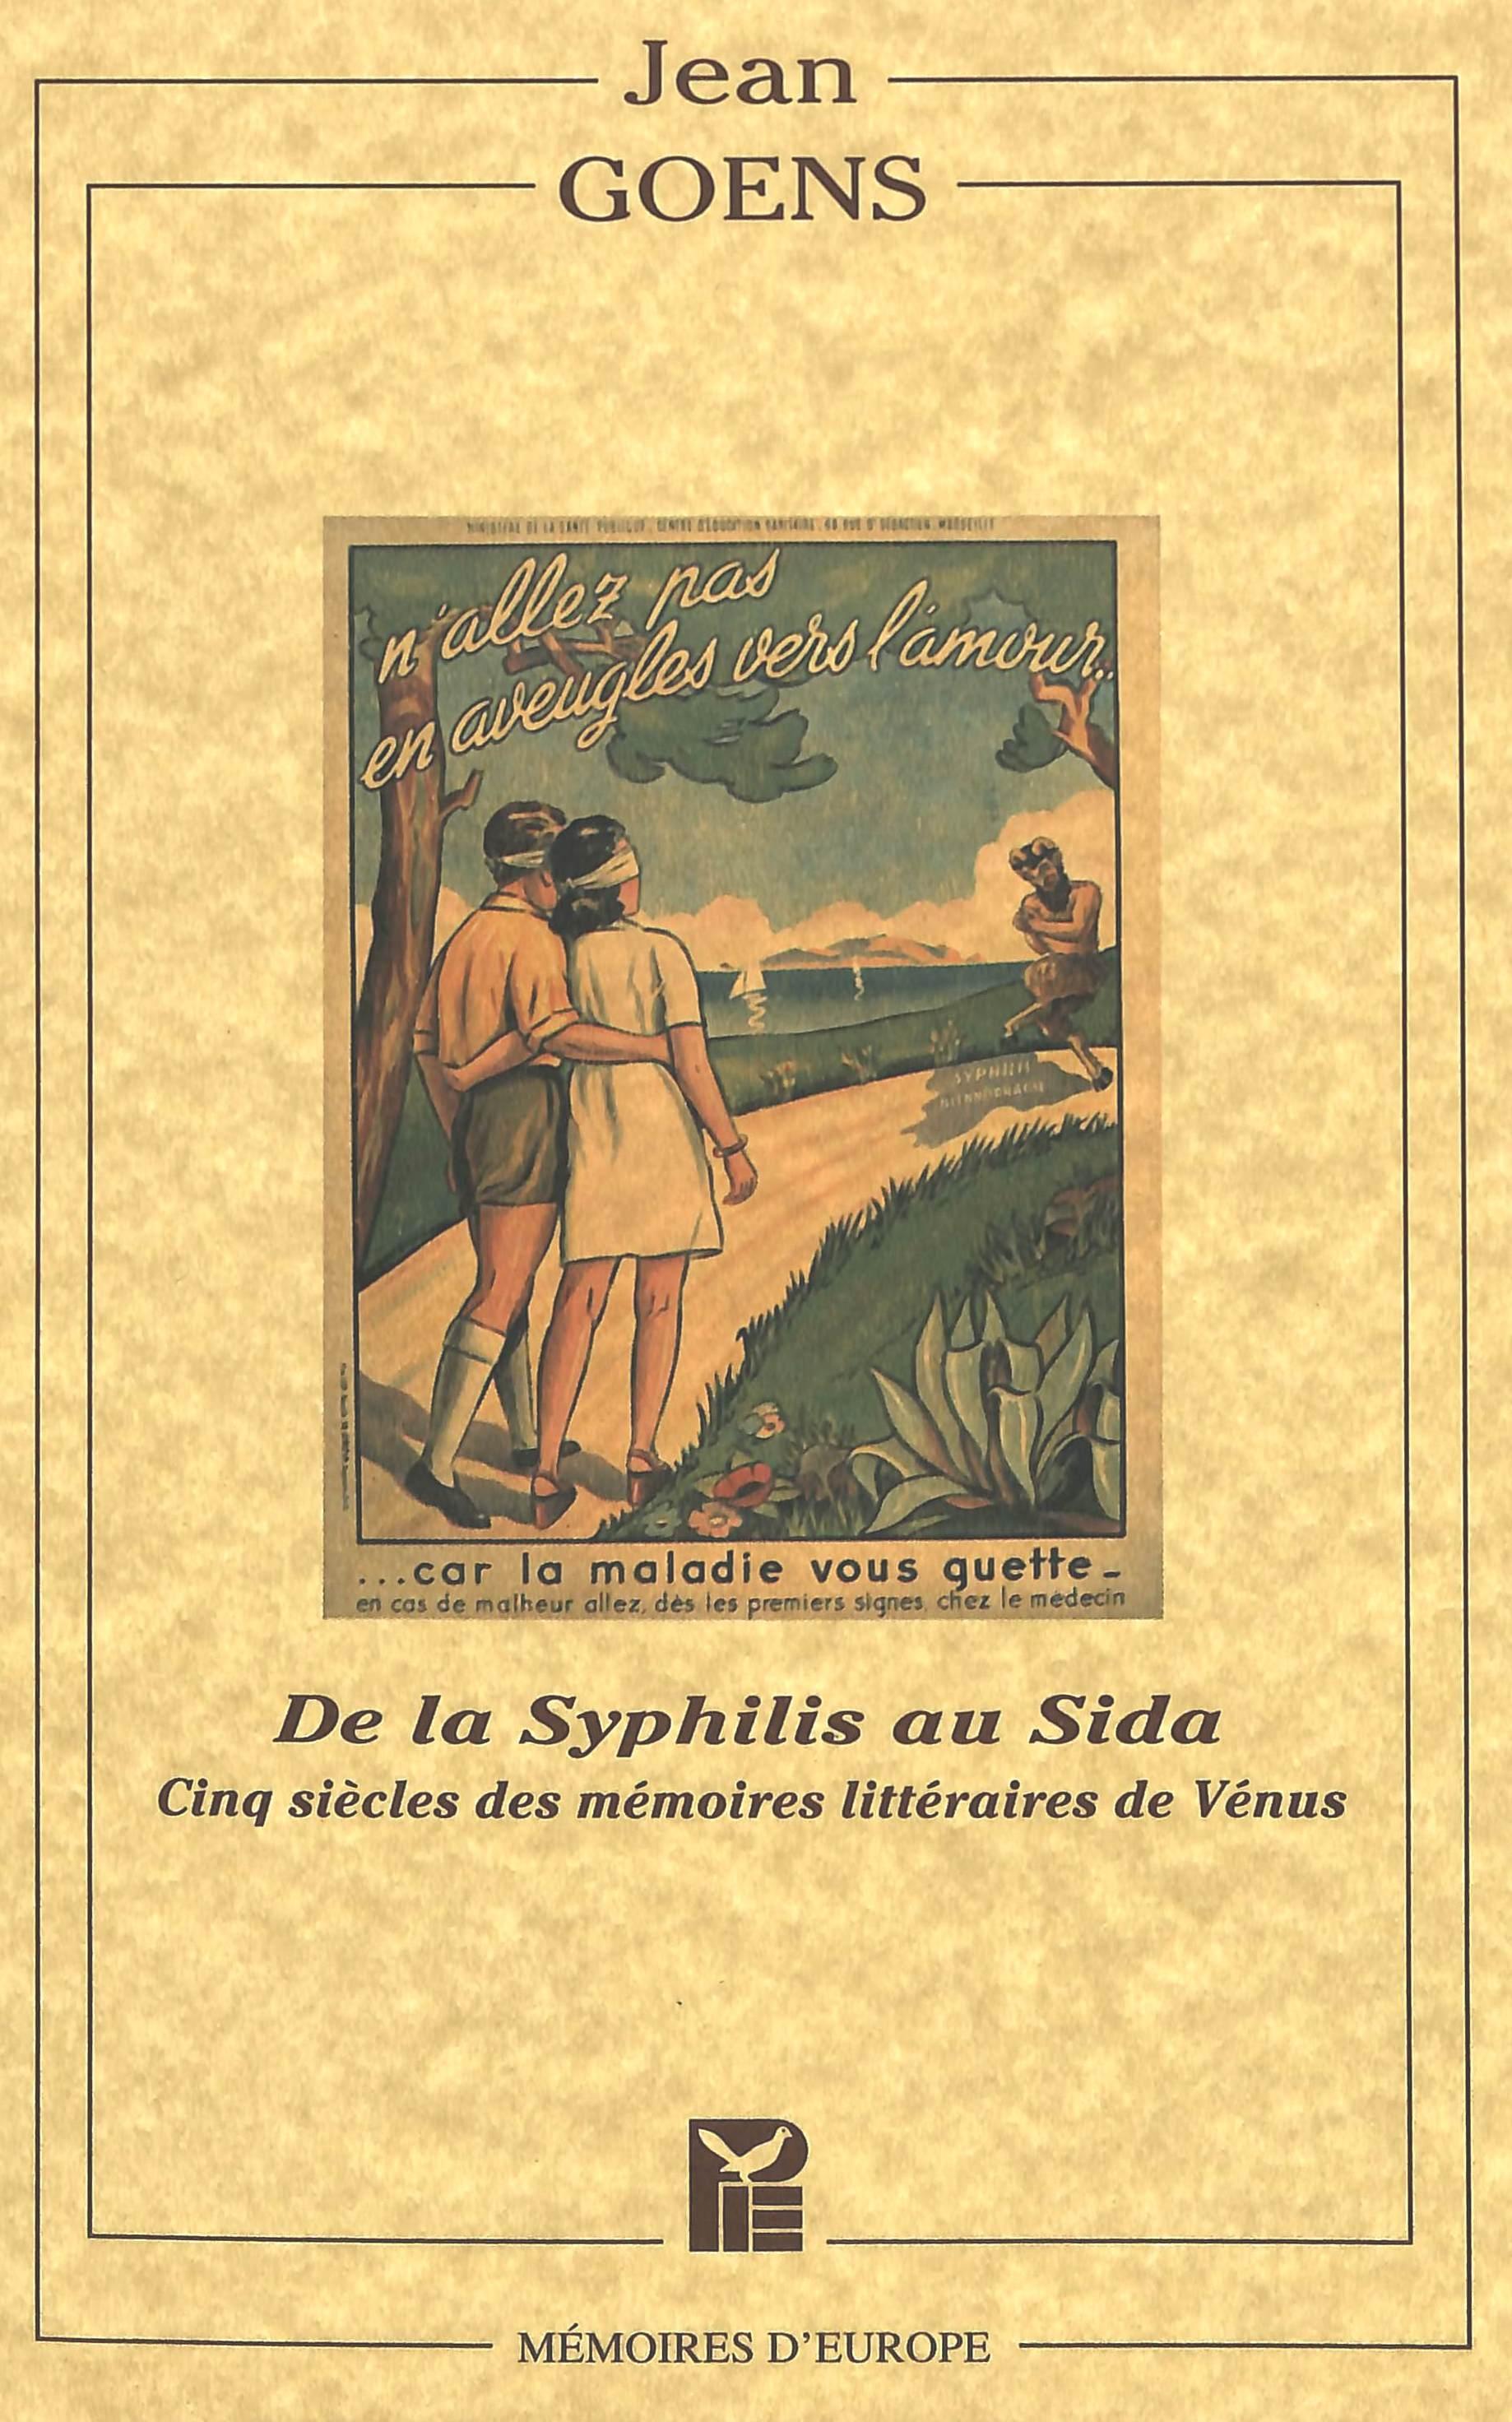 DE LA SYPHILIS AU SIDA